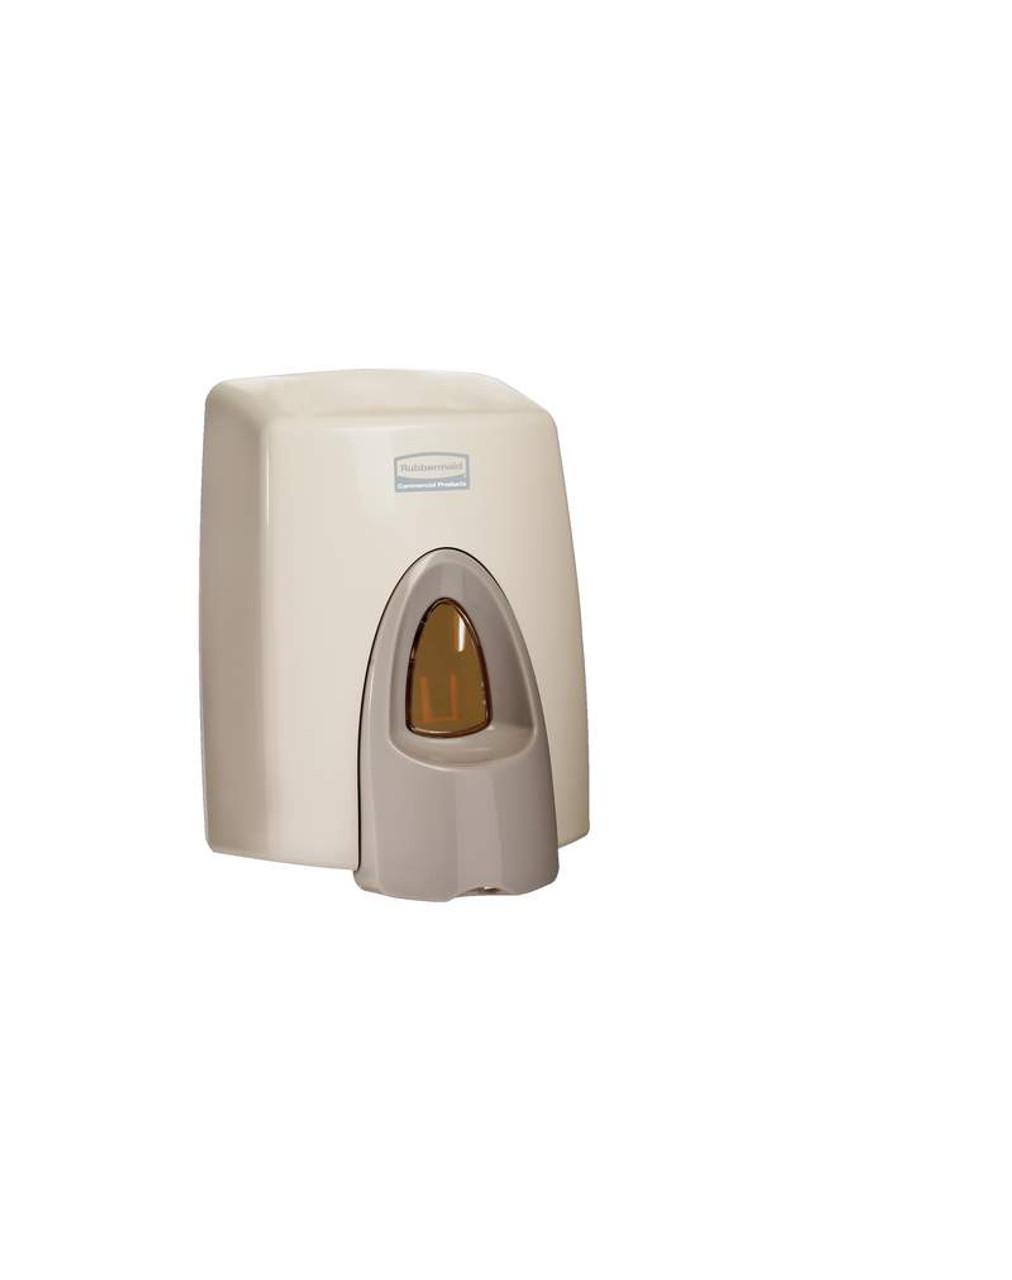 Rubbermaid 400ml Rubbermaid Foam Seat & Handle Cleaner Dispenser - White